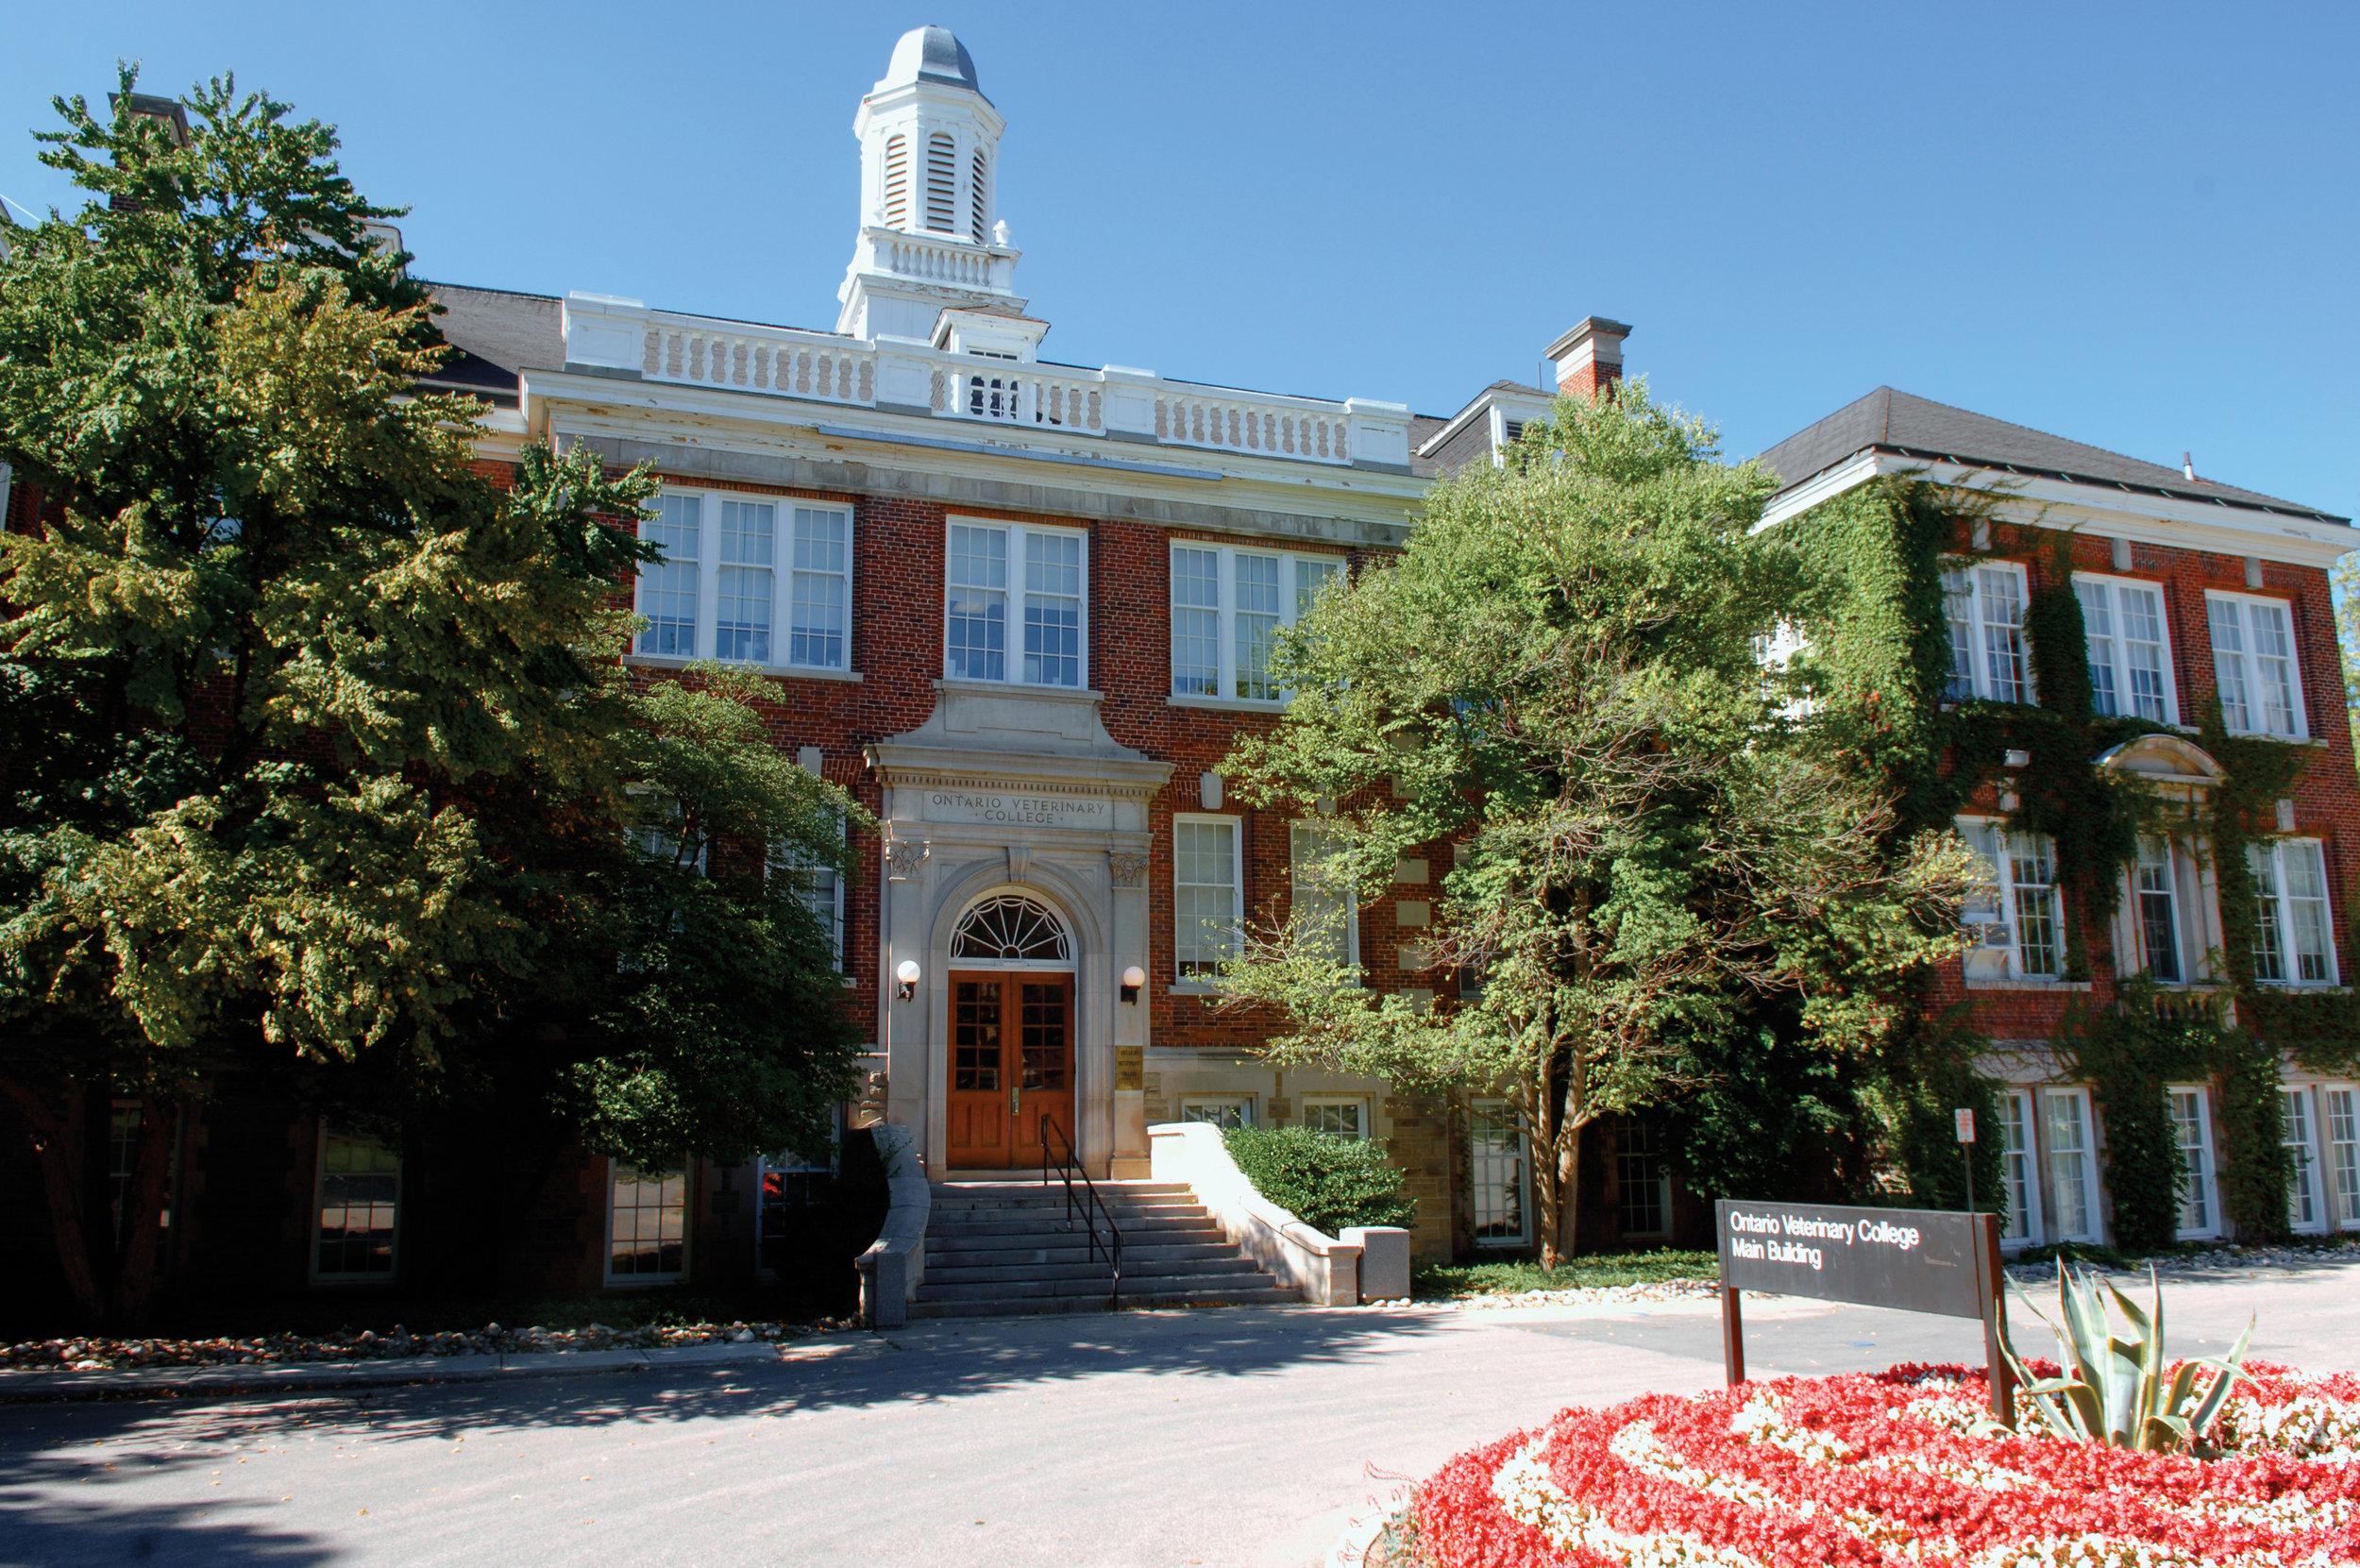 Ontario-Veterinary-College.jpg